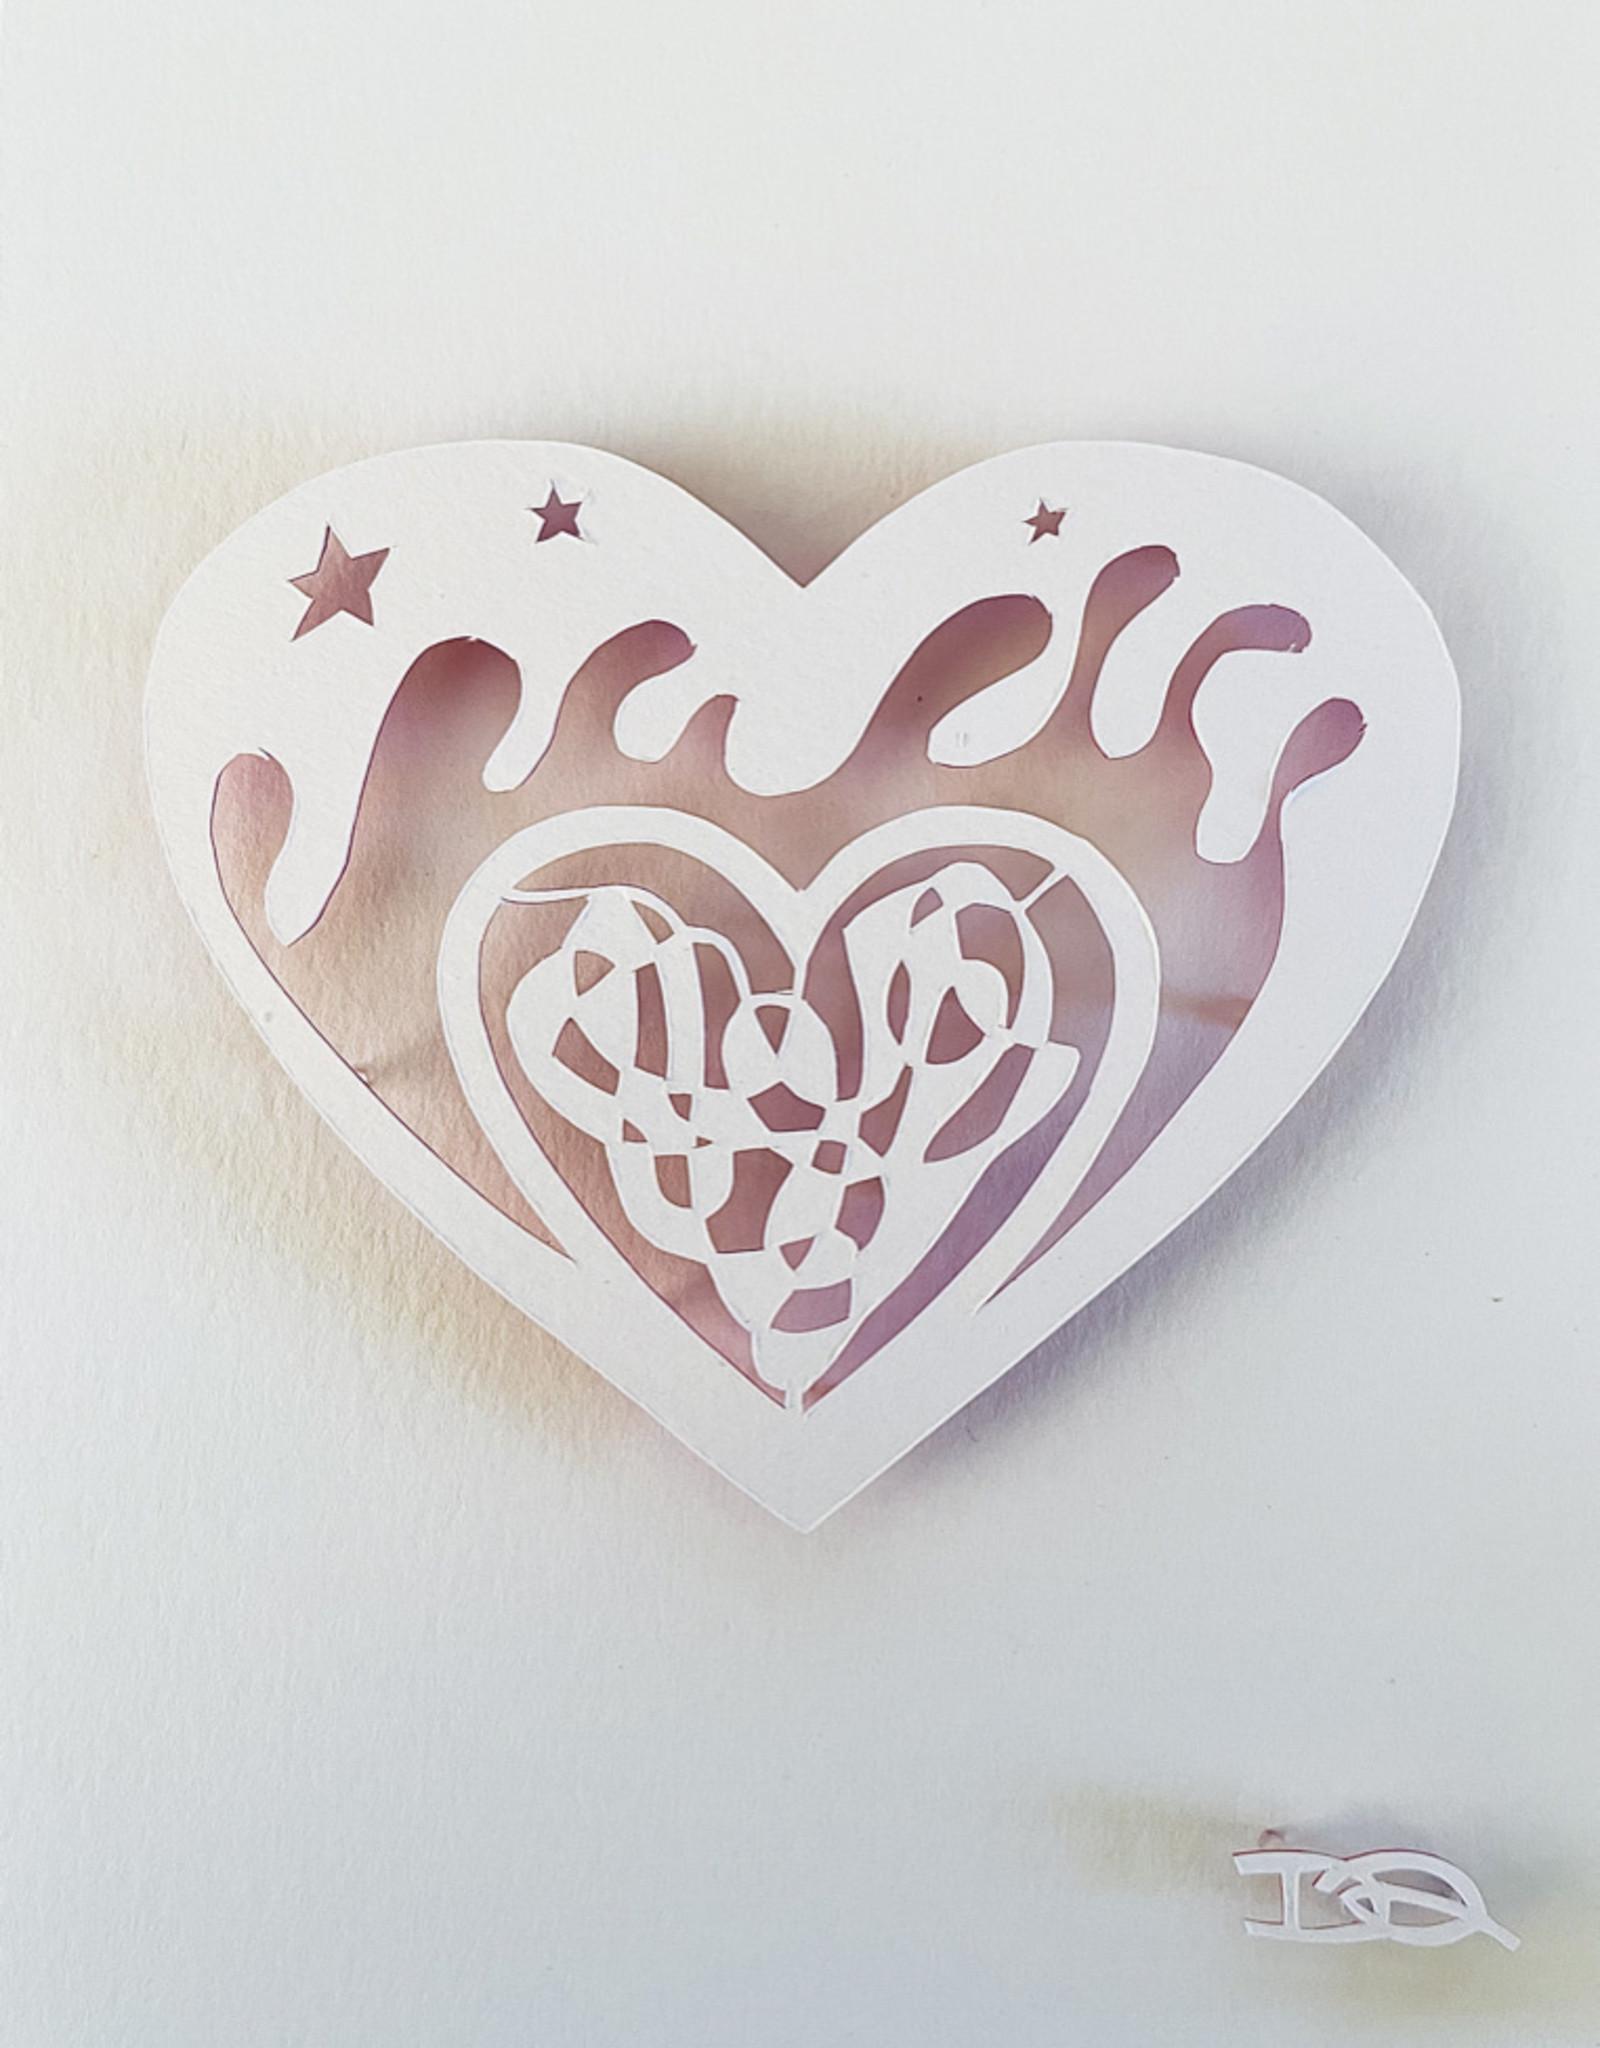 David Friedman White Valentine - Papercutting